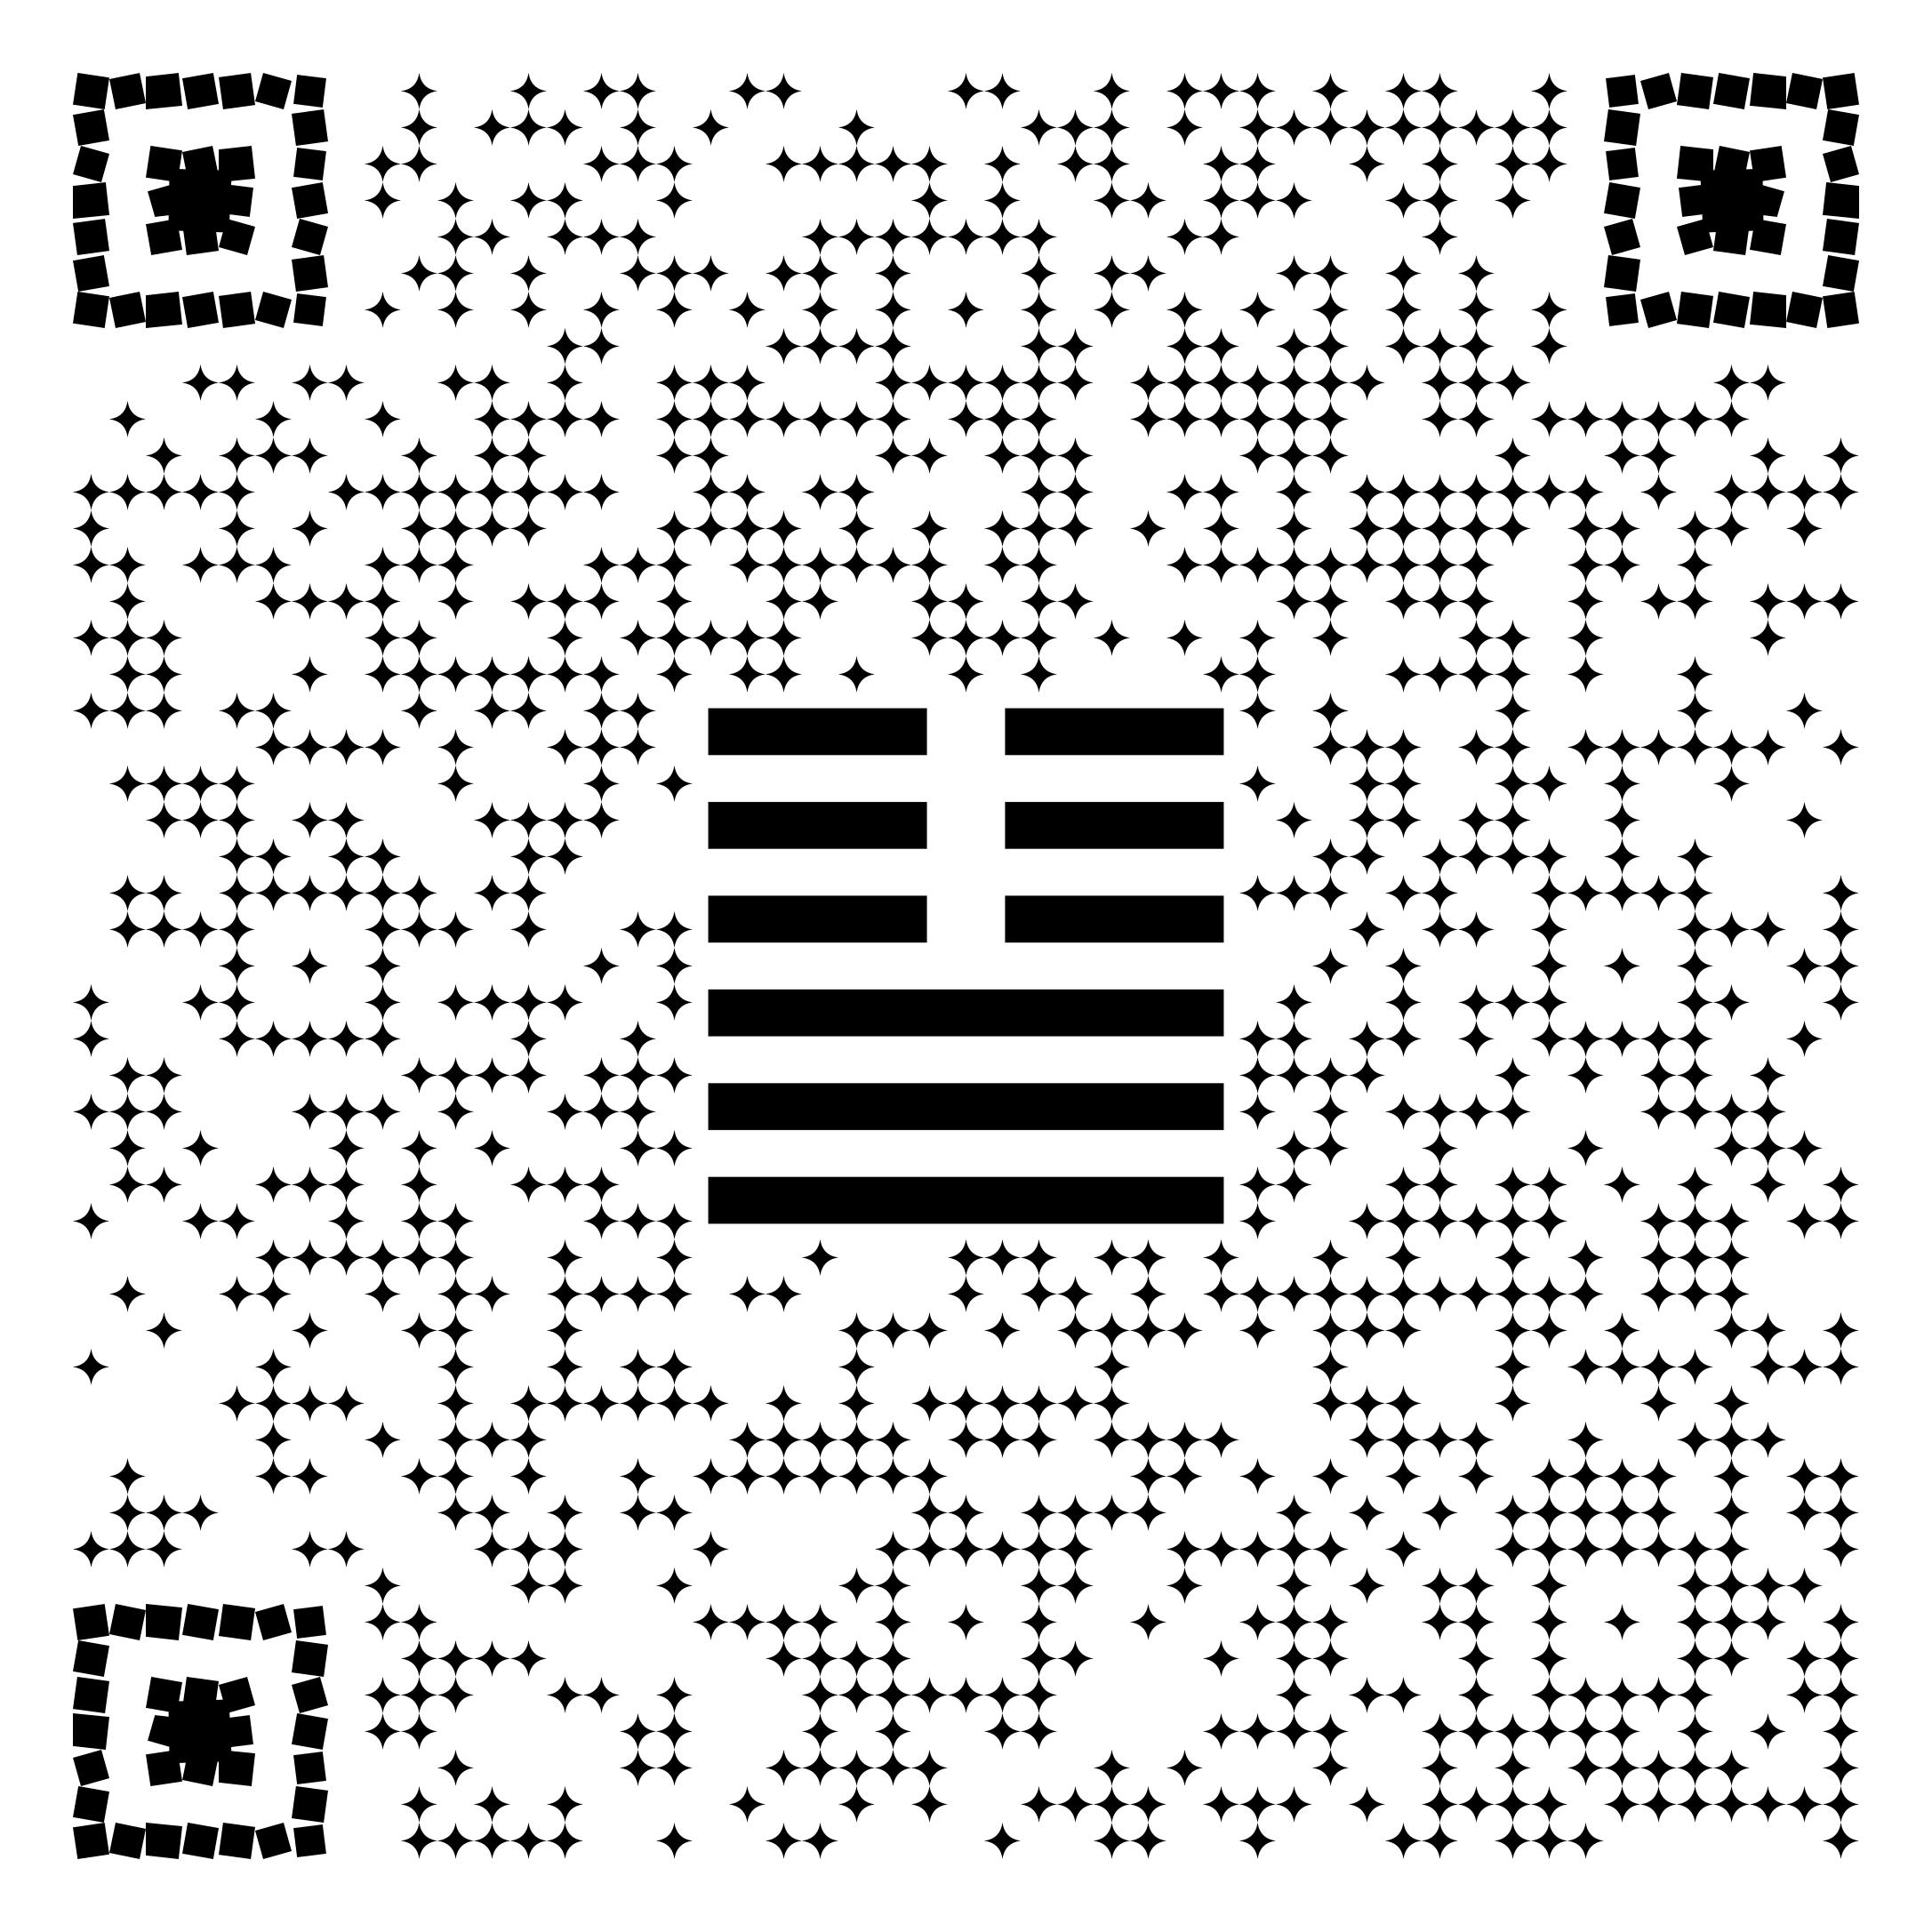 qr-code-11.png